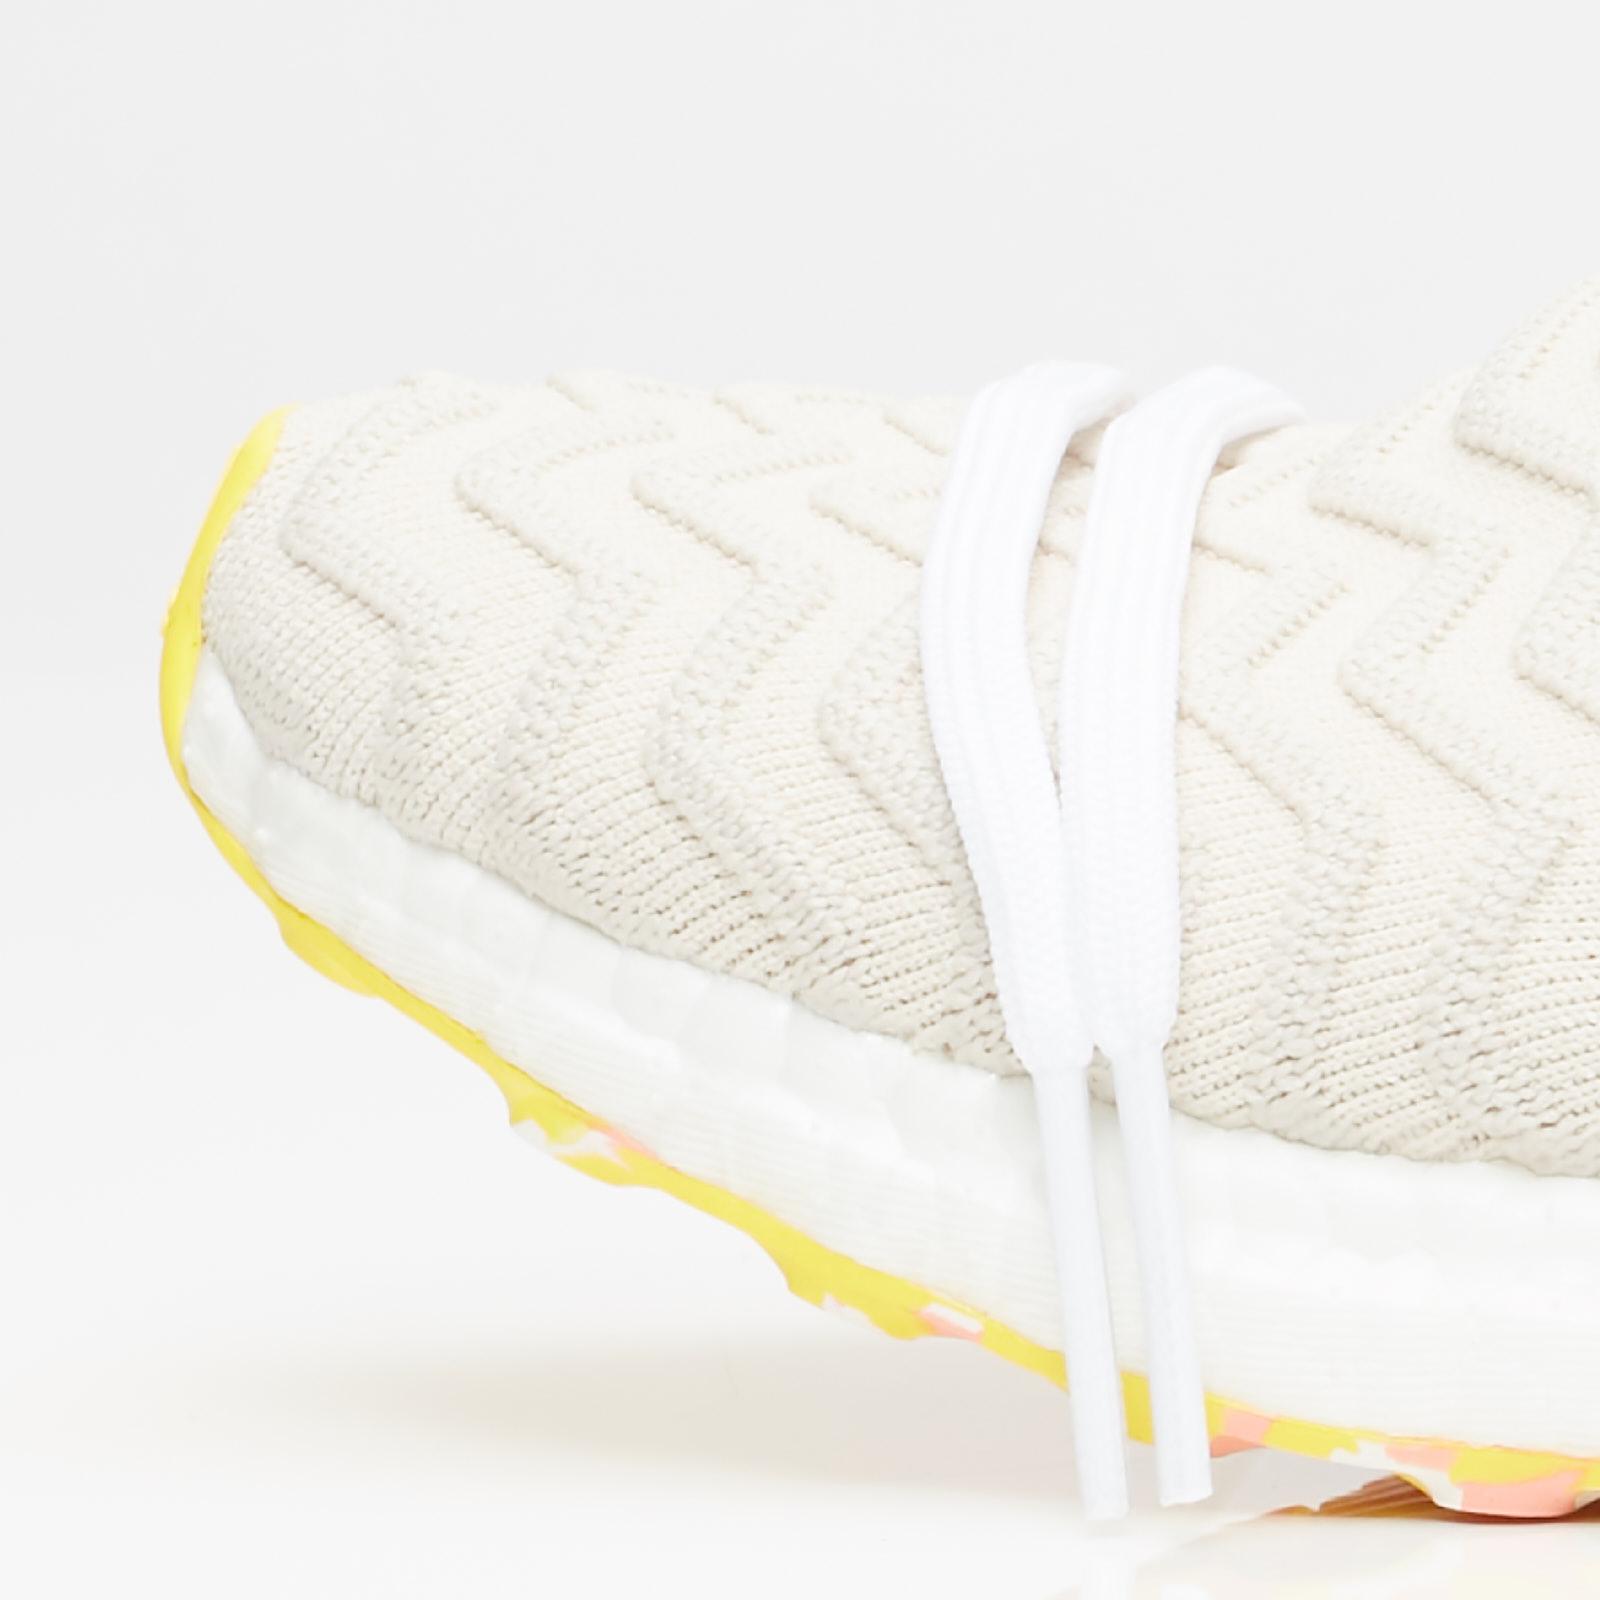 Oxido escaldadura Adaptación  adidas Ultraboost AKOG - Bb7370 - Sneakersnstuff | sneakers & streetwear  online since 1999